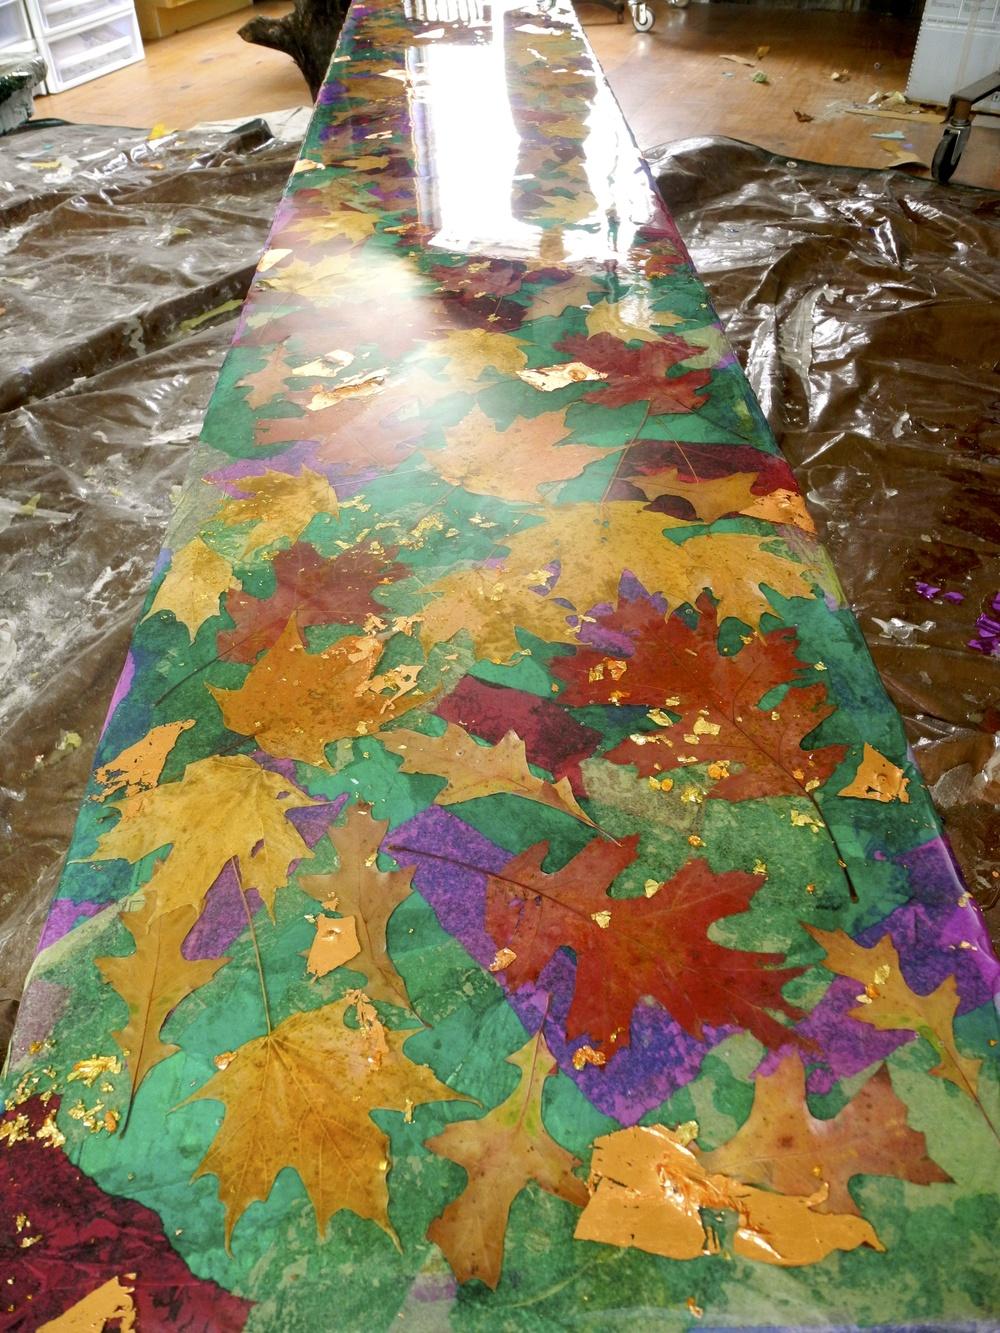 Recycled Art Bench by Shelita Benash